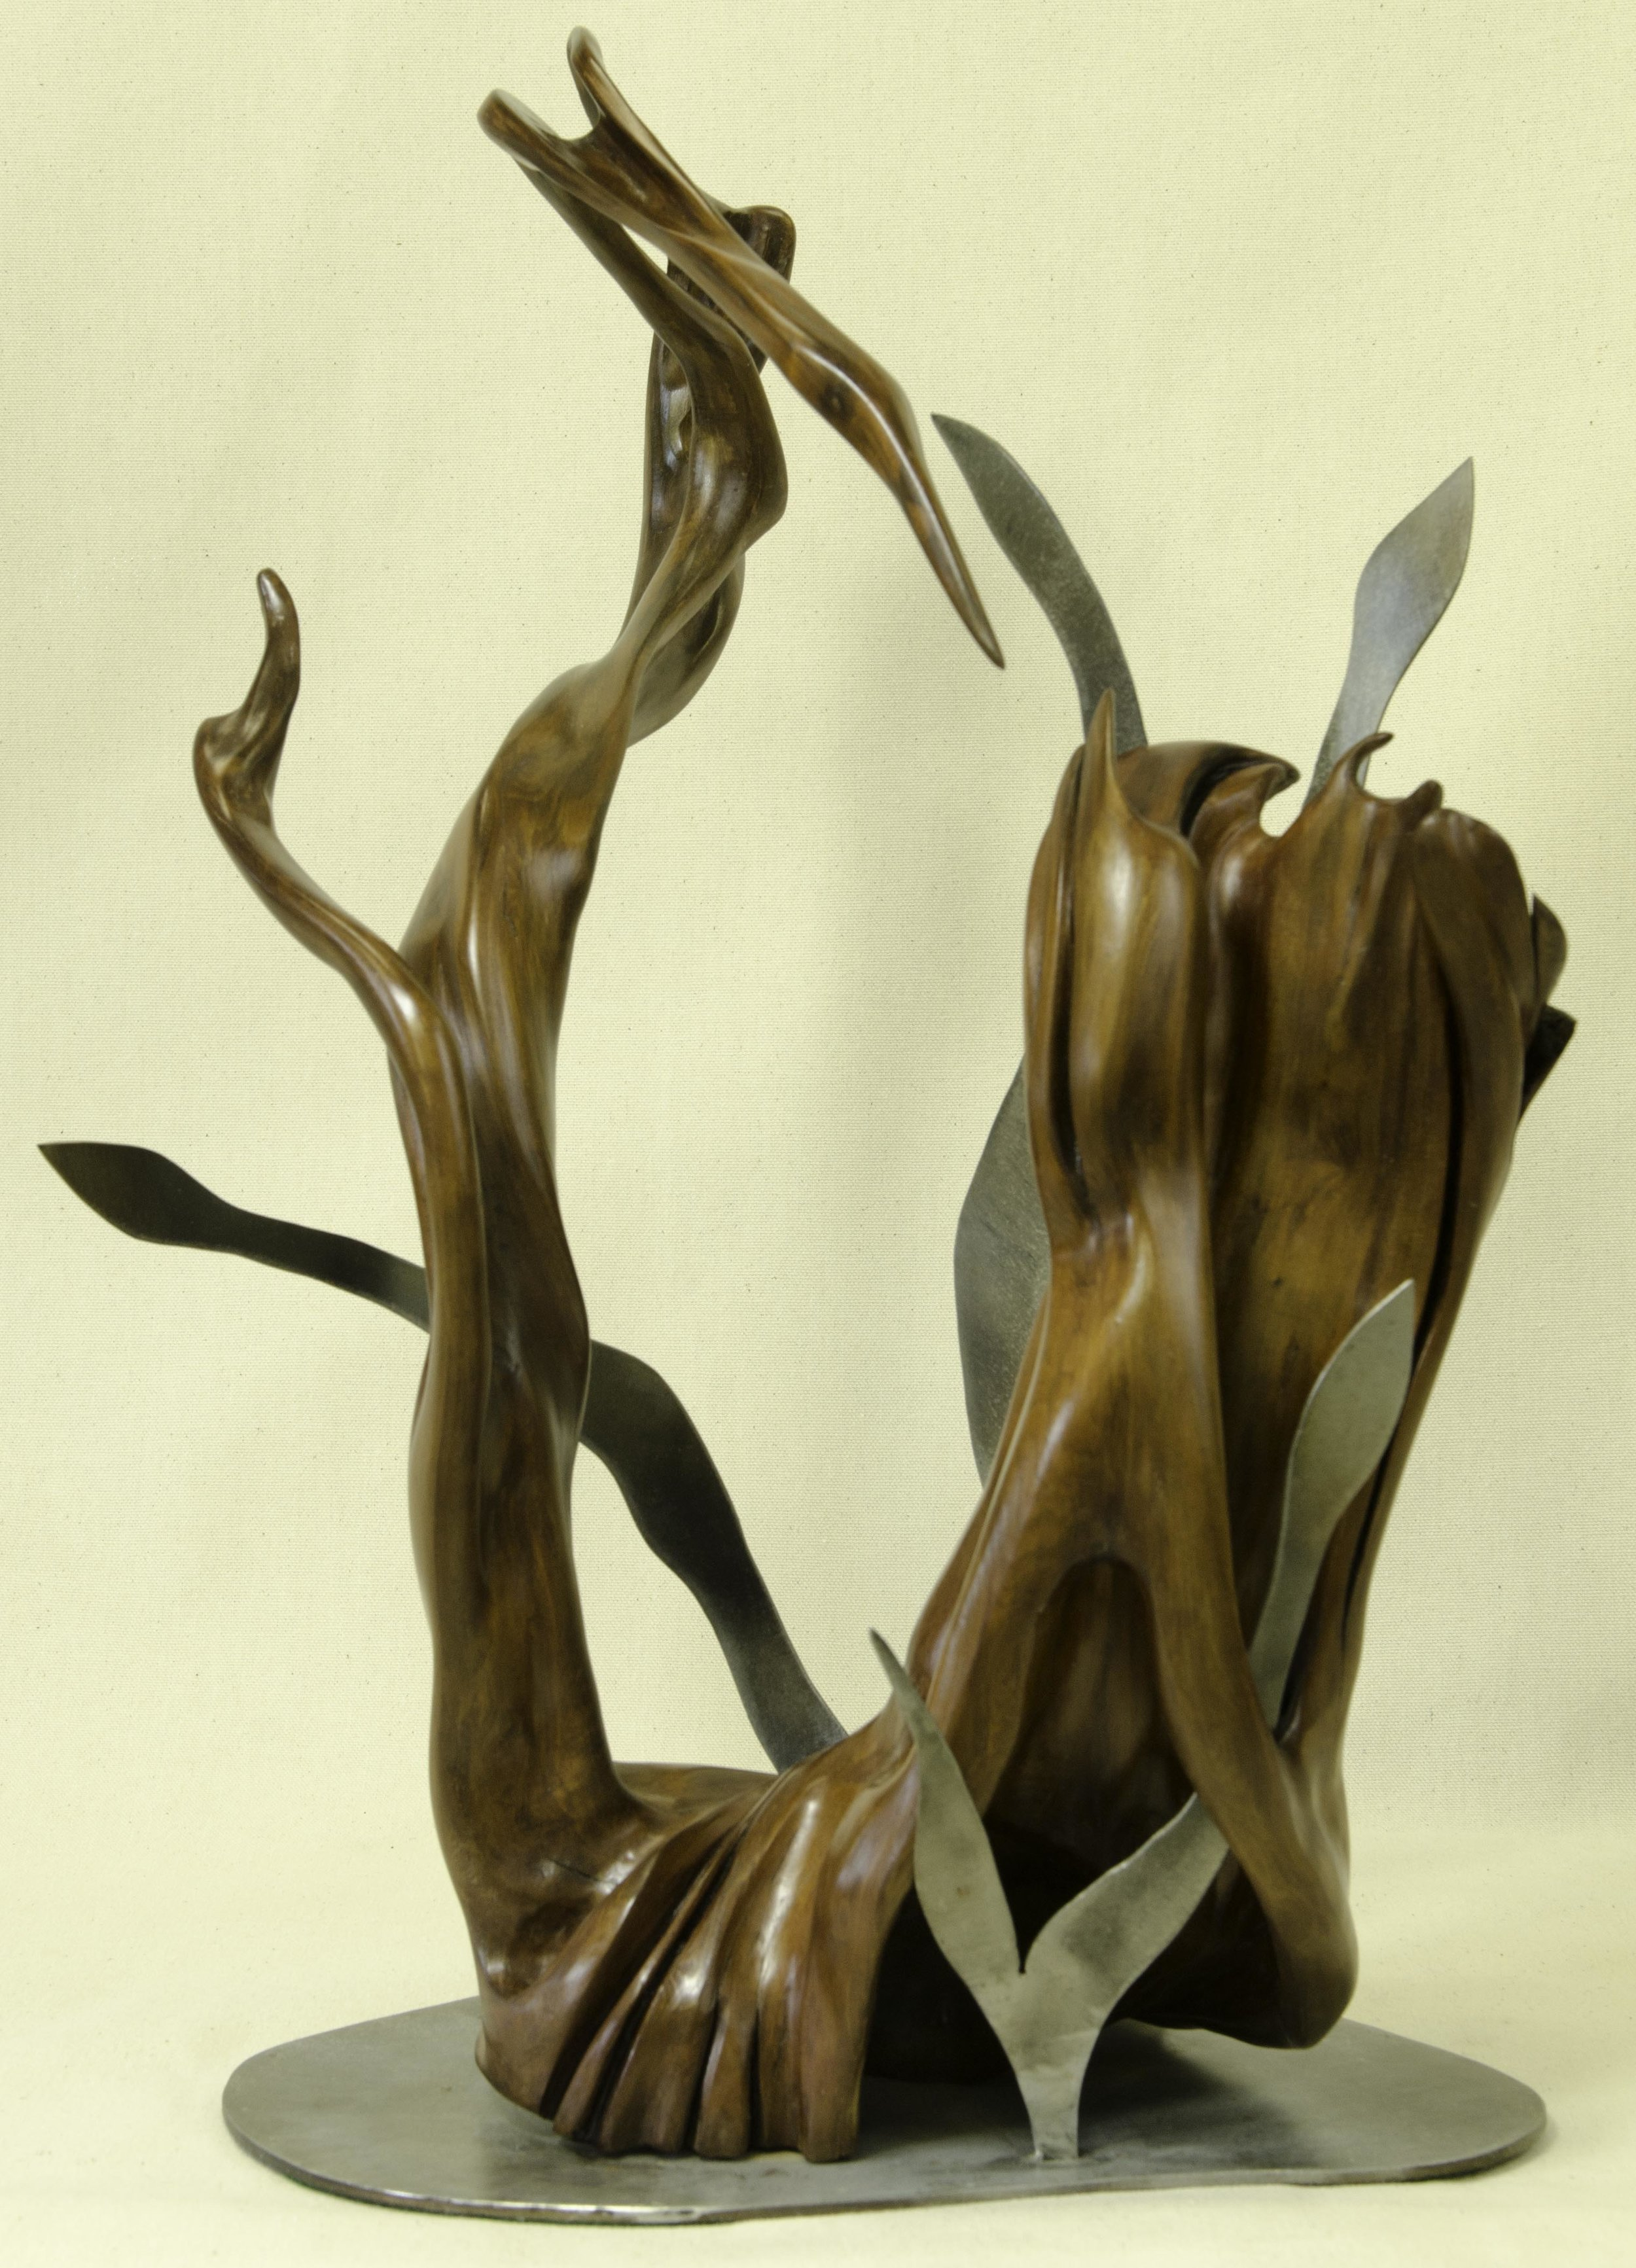 Dance of the Herons by Tuttie Peetz